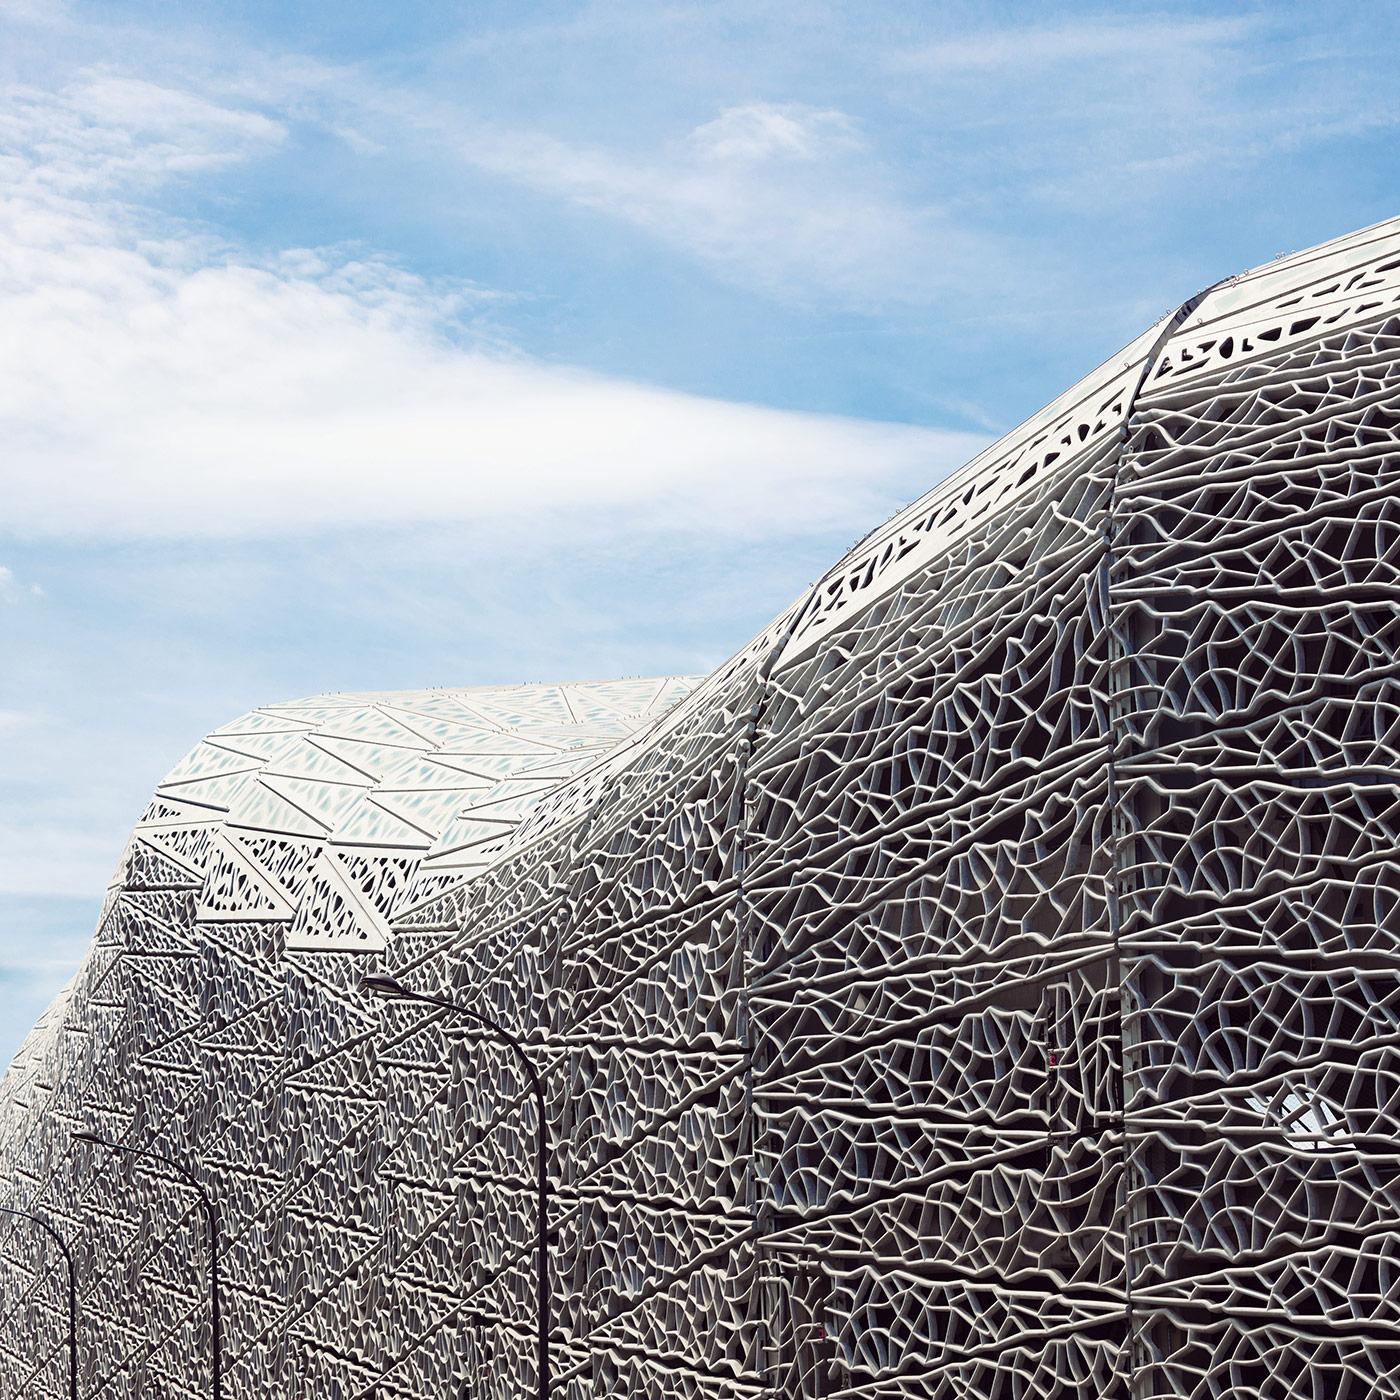 Stade Jean-Bouin <br />Location: Paris, France <br />Architects: Rudy Ricciotti